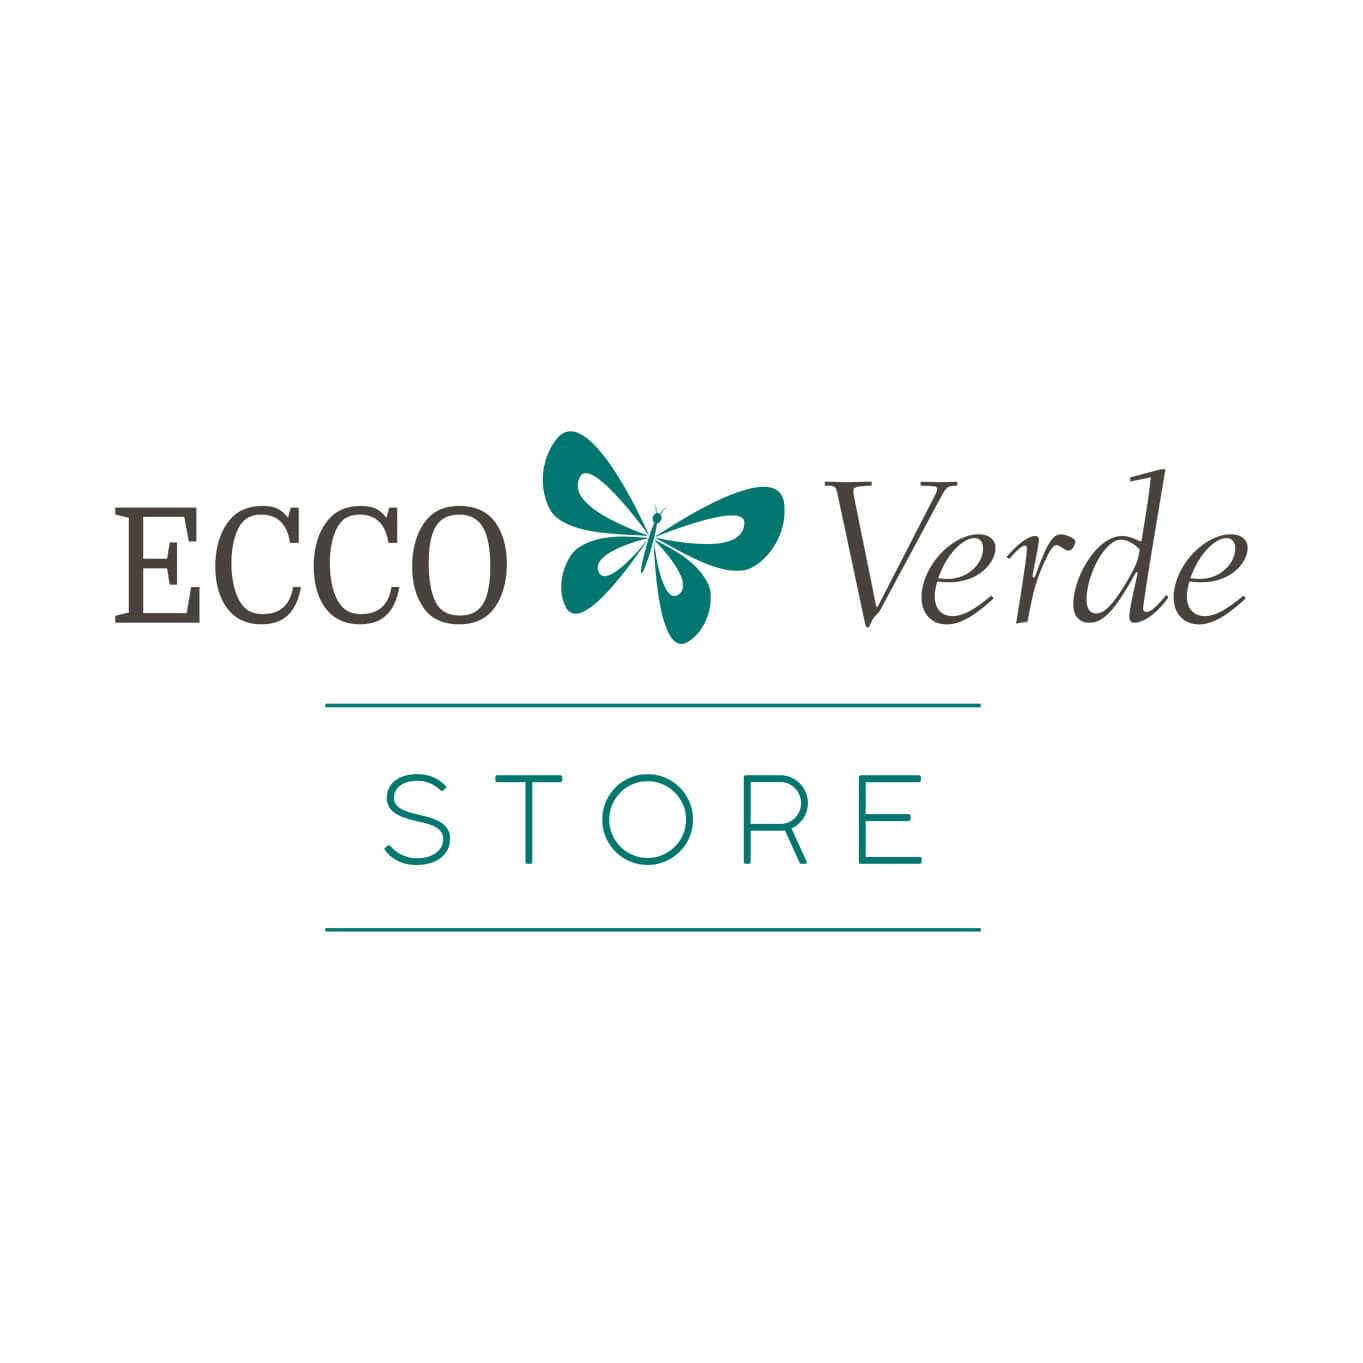 Ecco Verde Store